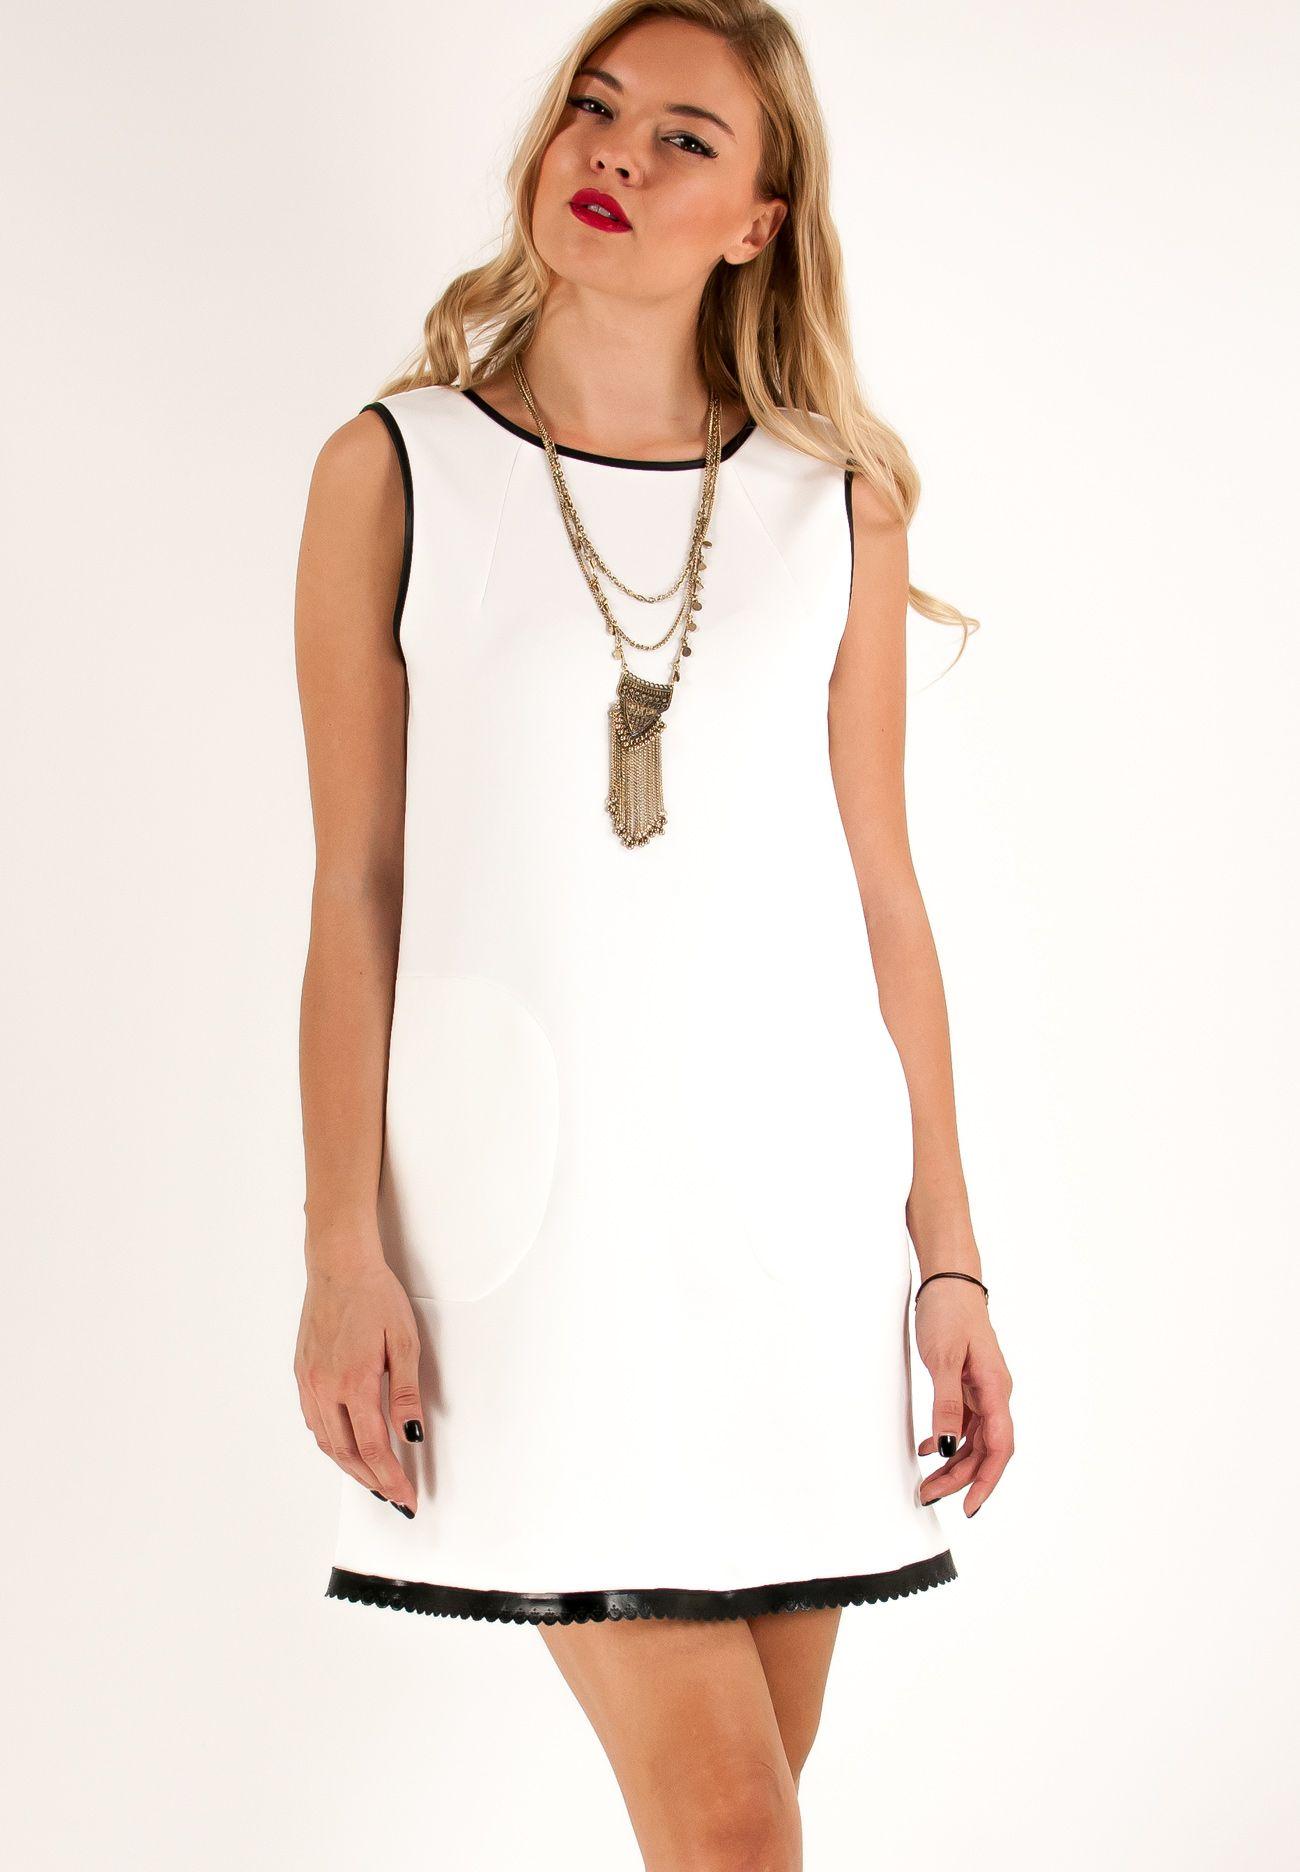 23350afb8b5b Μίνι αμάνικο φόρεμα σε ίσια γραμμή με τσέπες στα πλάγια και δερμάτινη  λεπτομέρεια στο στρίφωμα.